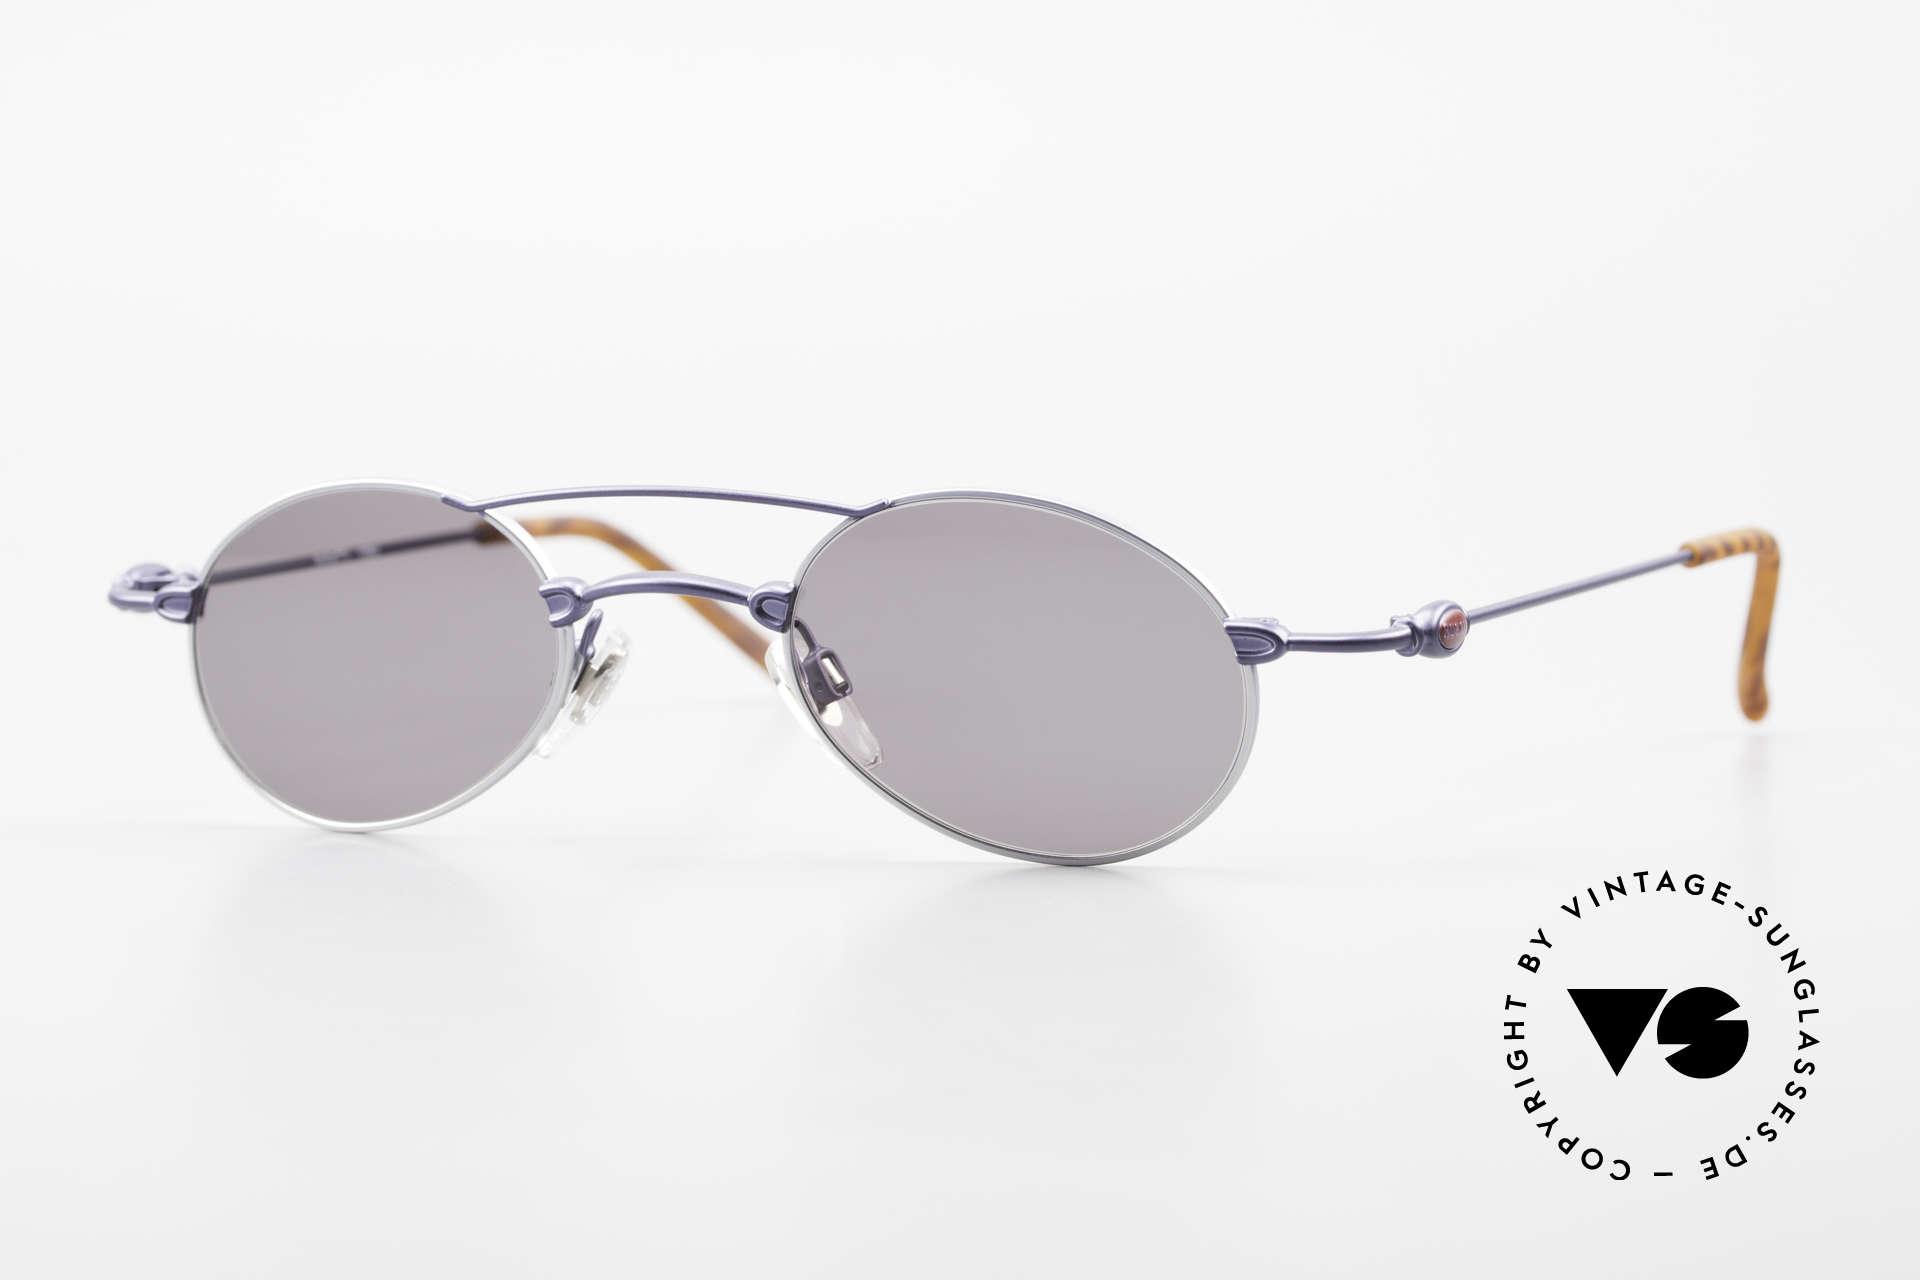 Bugatti 10864 Oval Vintage Sunglasses Men, wispy & leightweight designer sunglasses by Bugatti, Made for Men